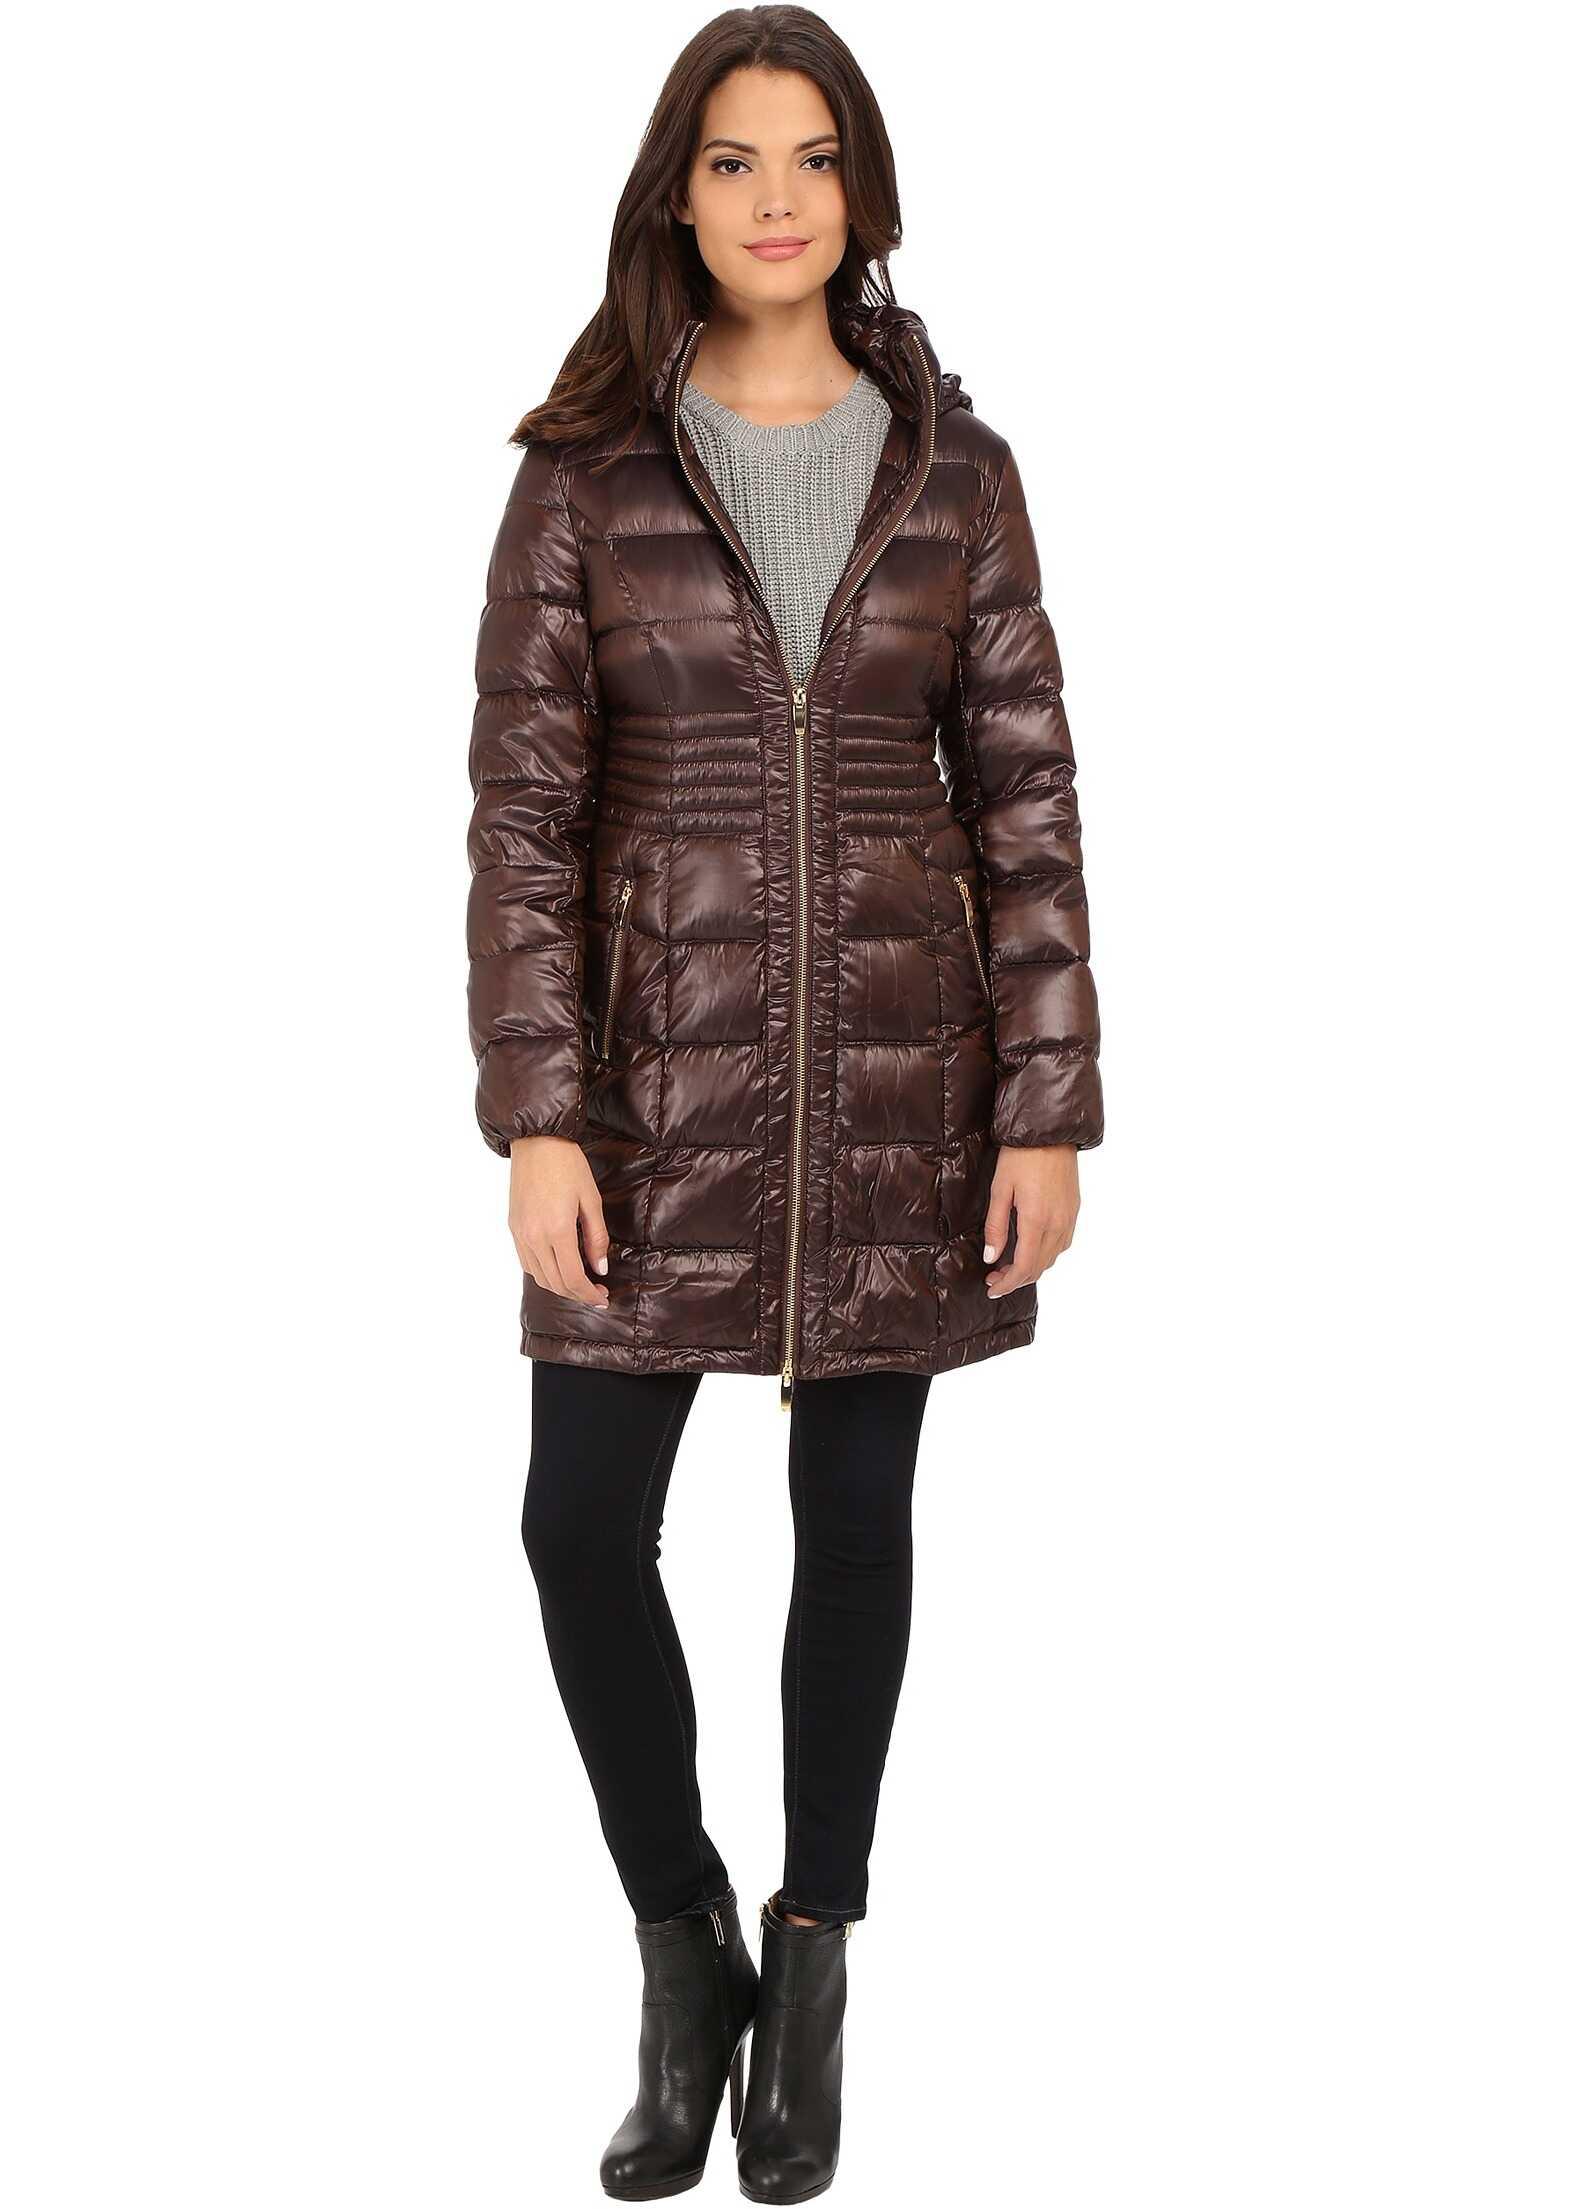 Via Spiga Hooded Packable Coat w/ Corset Waist Copper